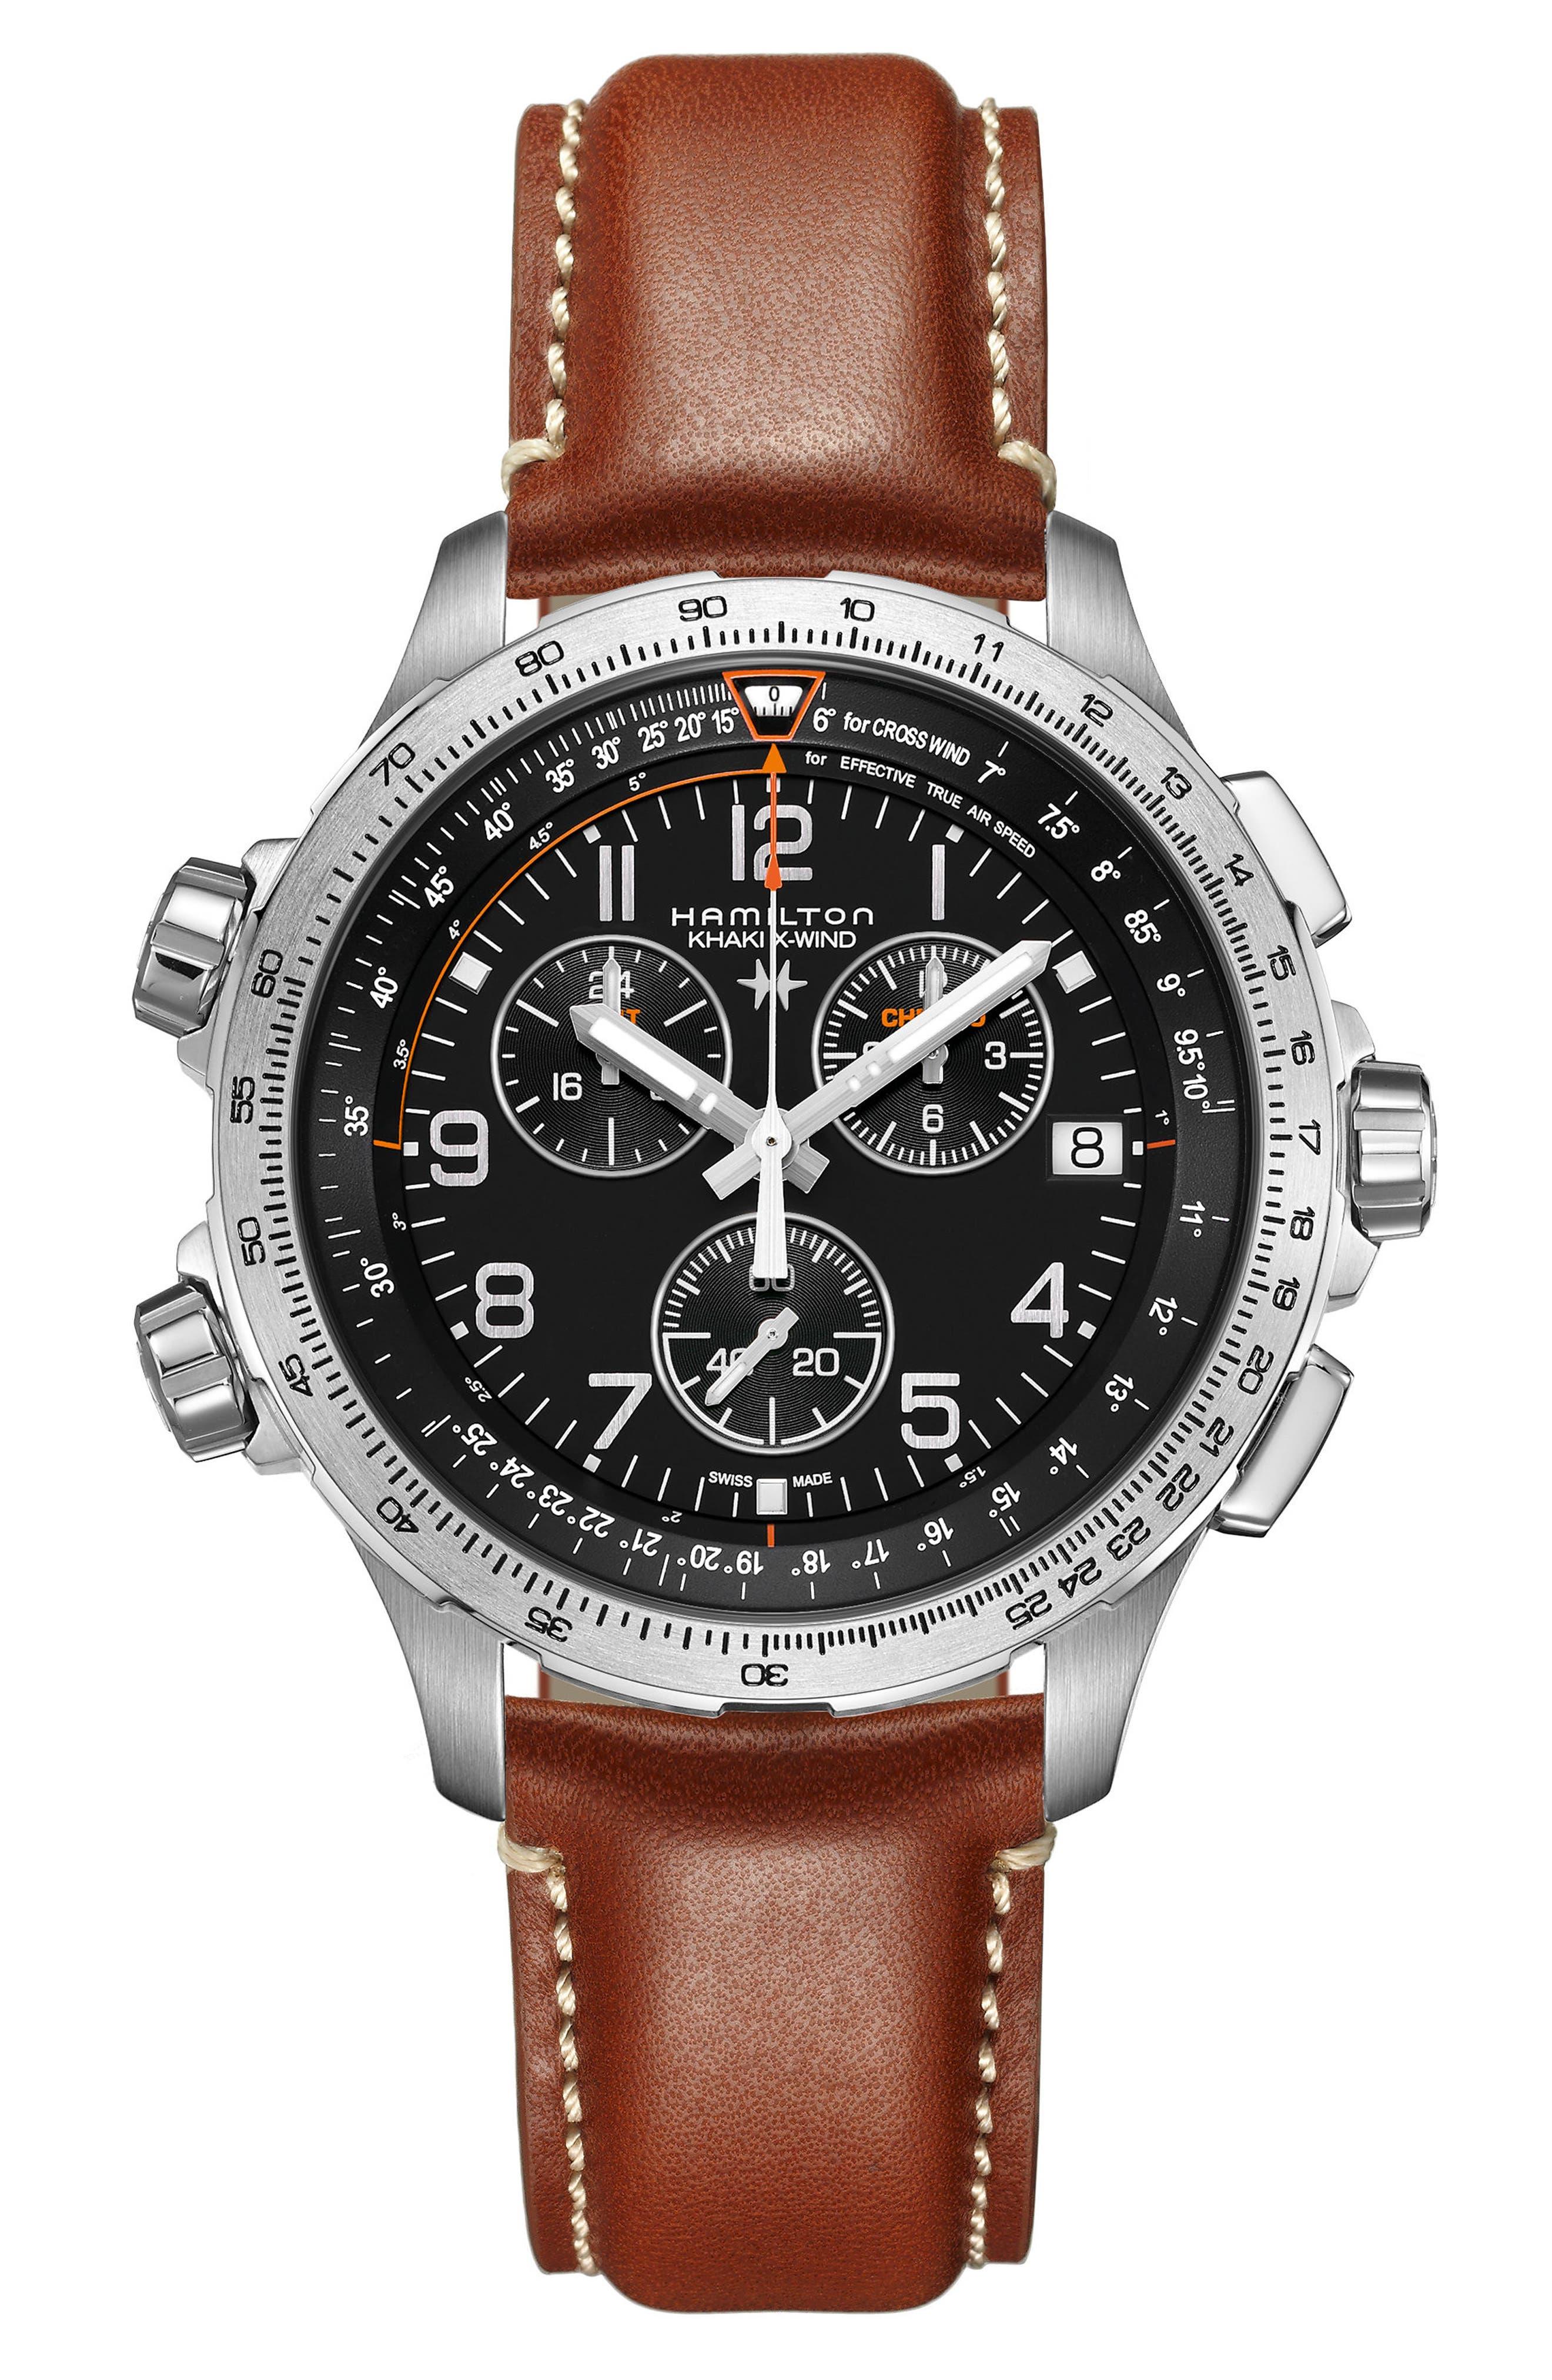 HAMILTON Khaki X-Wind Chronograph Leather Strap Watch, 46mm